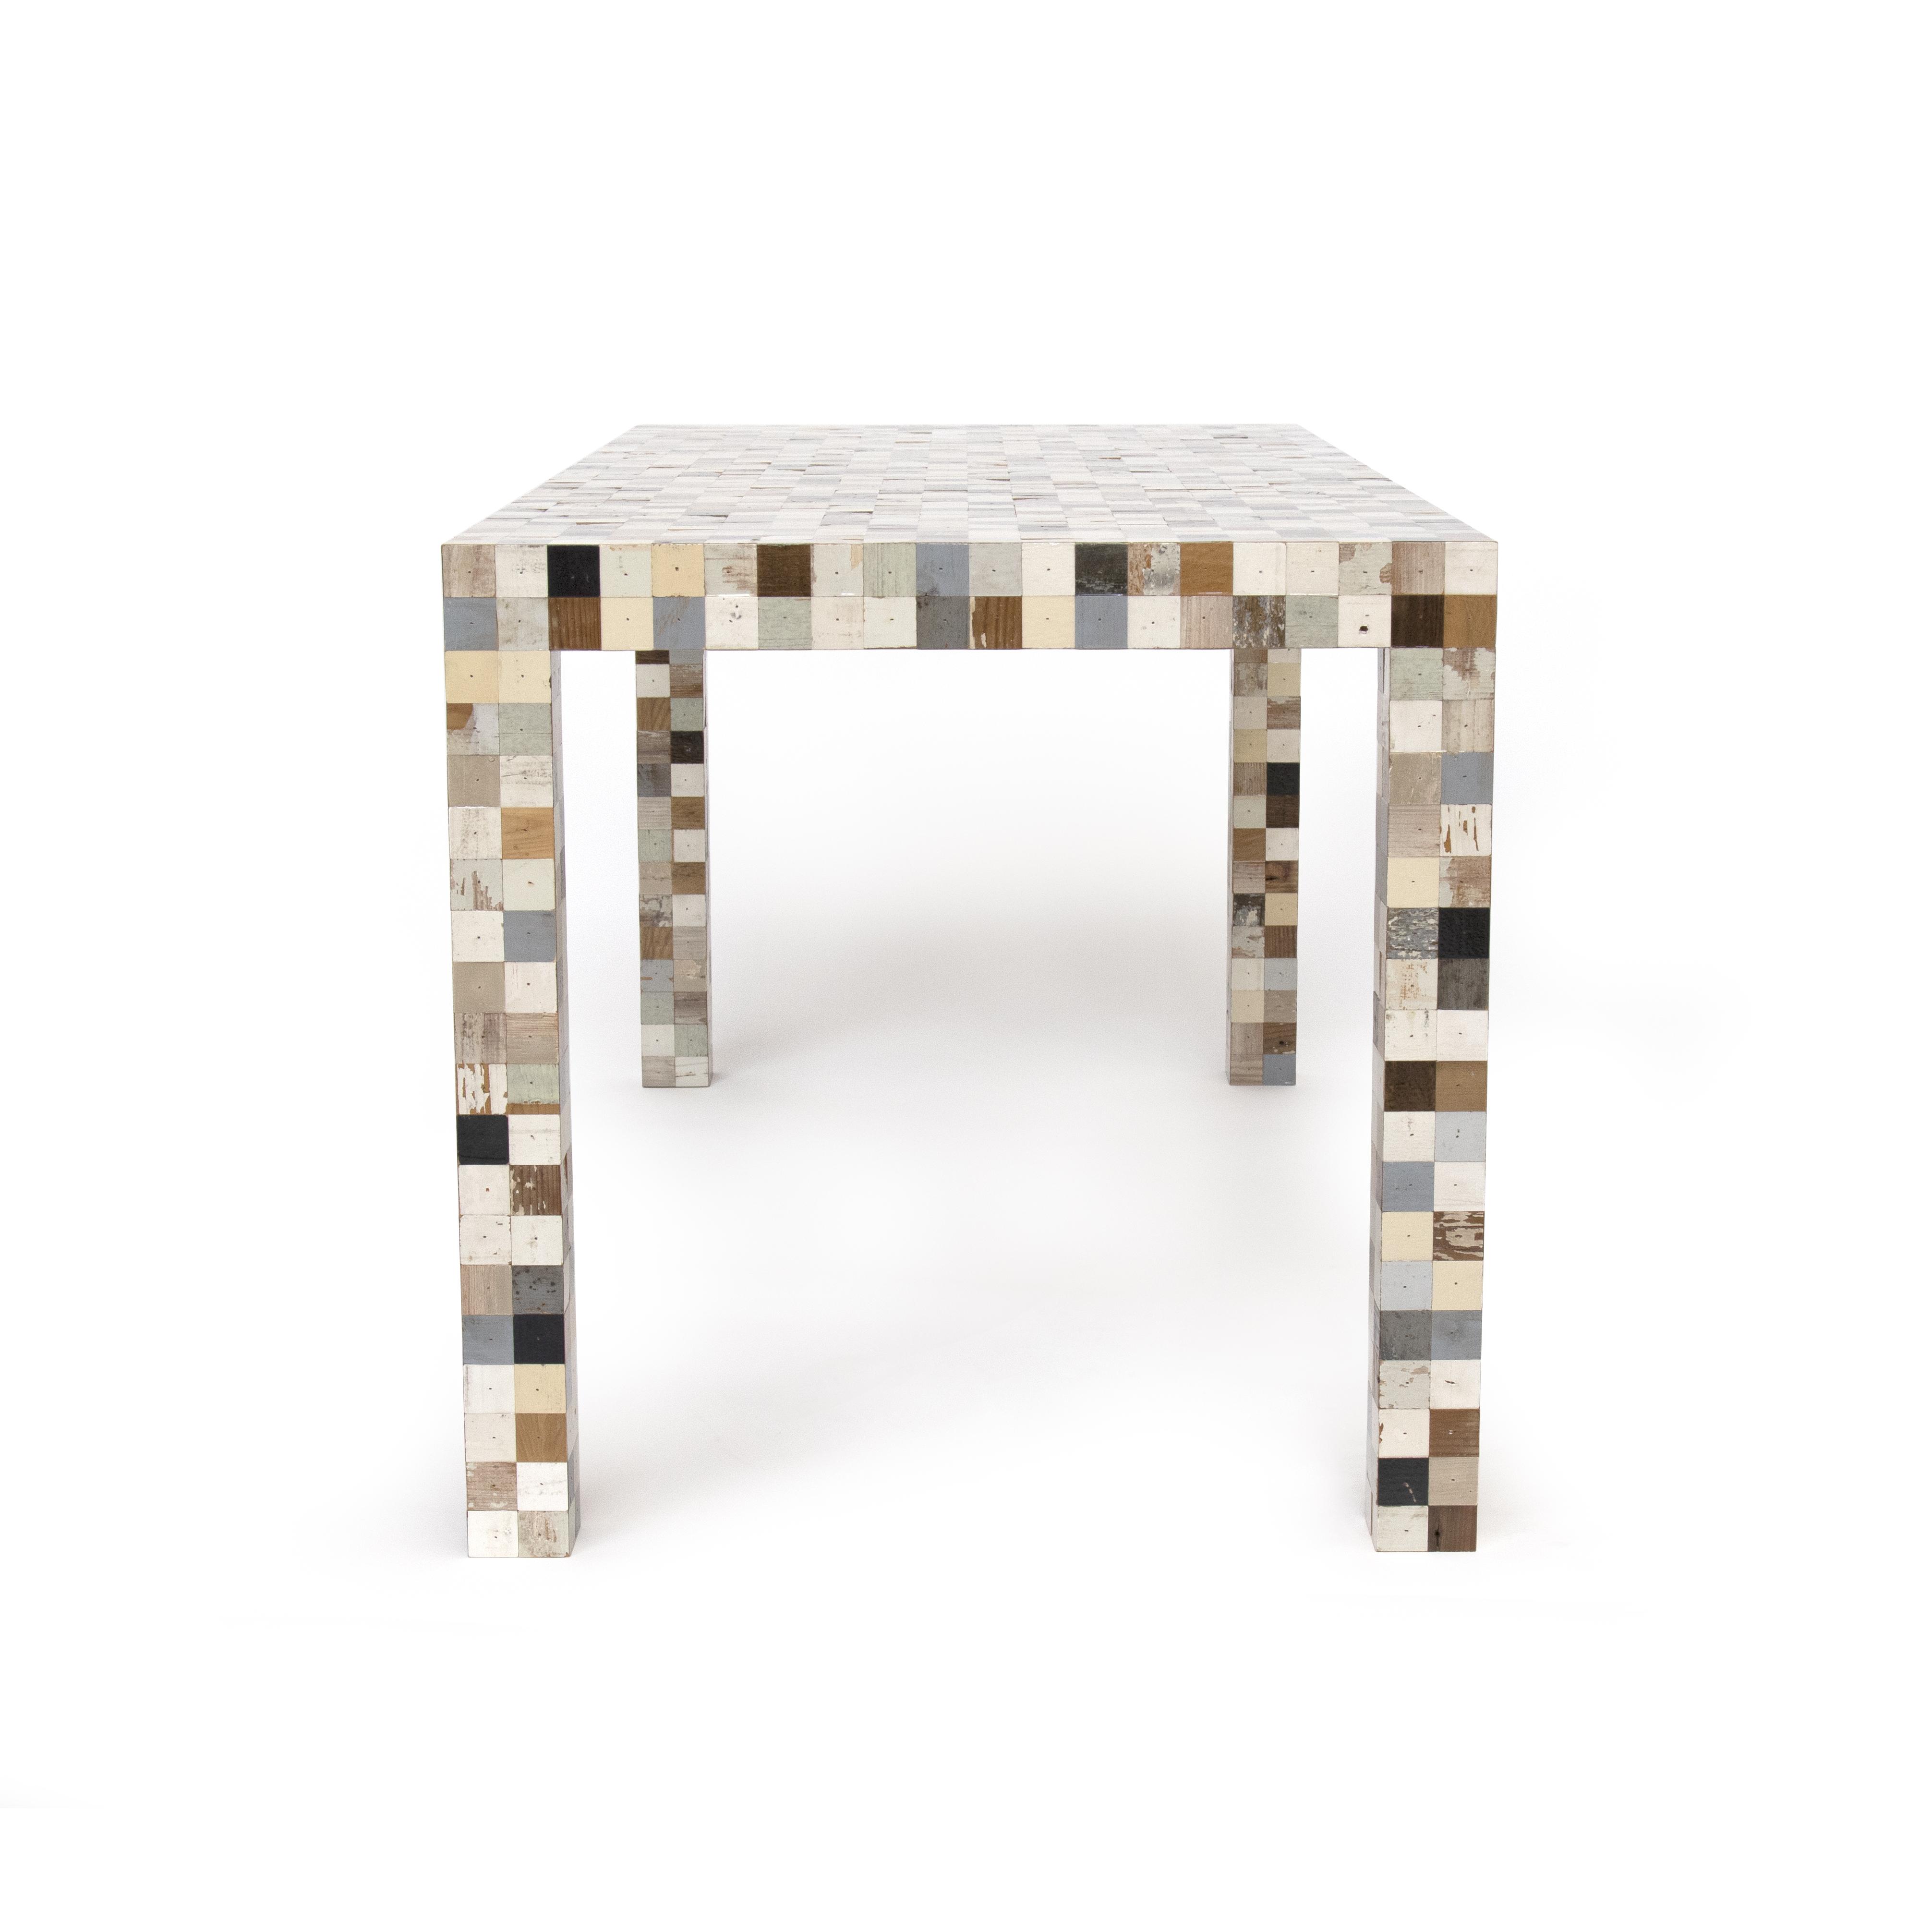 04_40x40-table_side_thumbnail